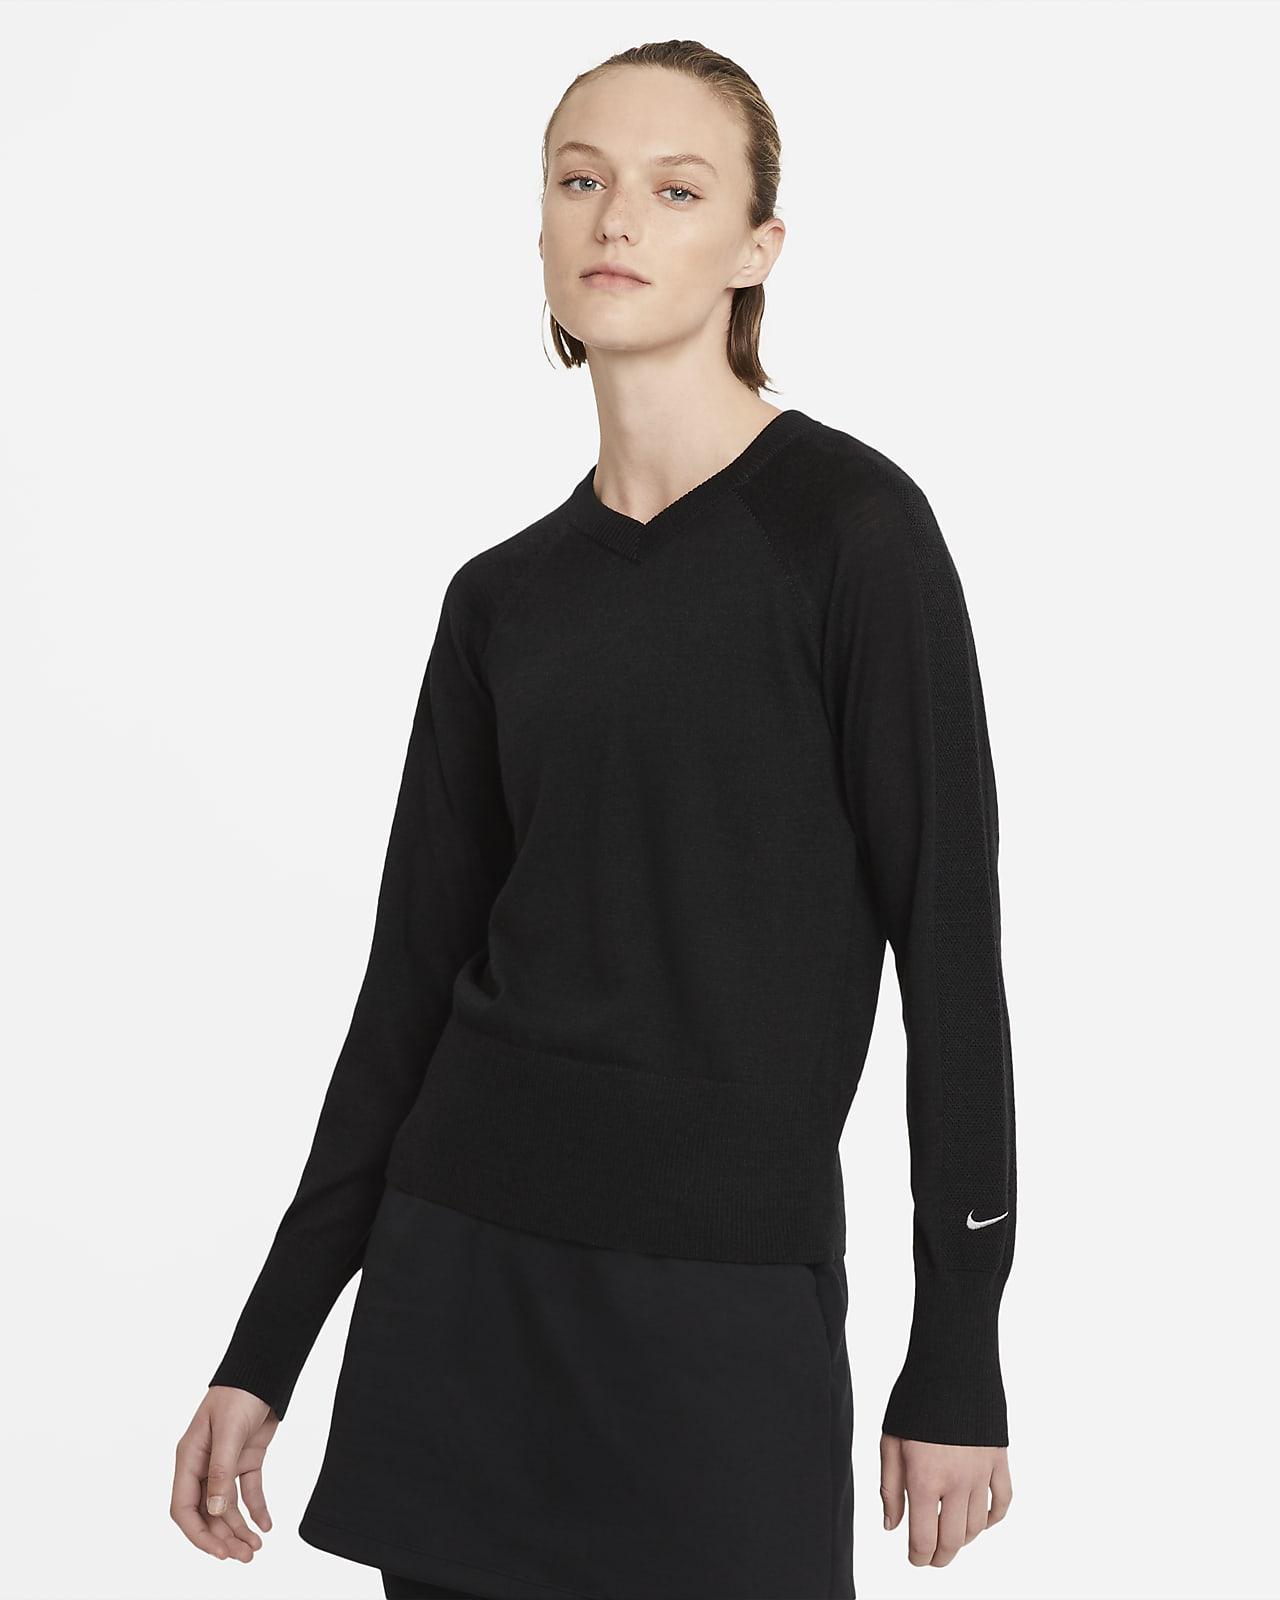 Sweater de golf de manga larga para mujer Nike Ace